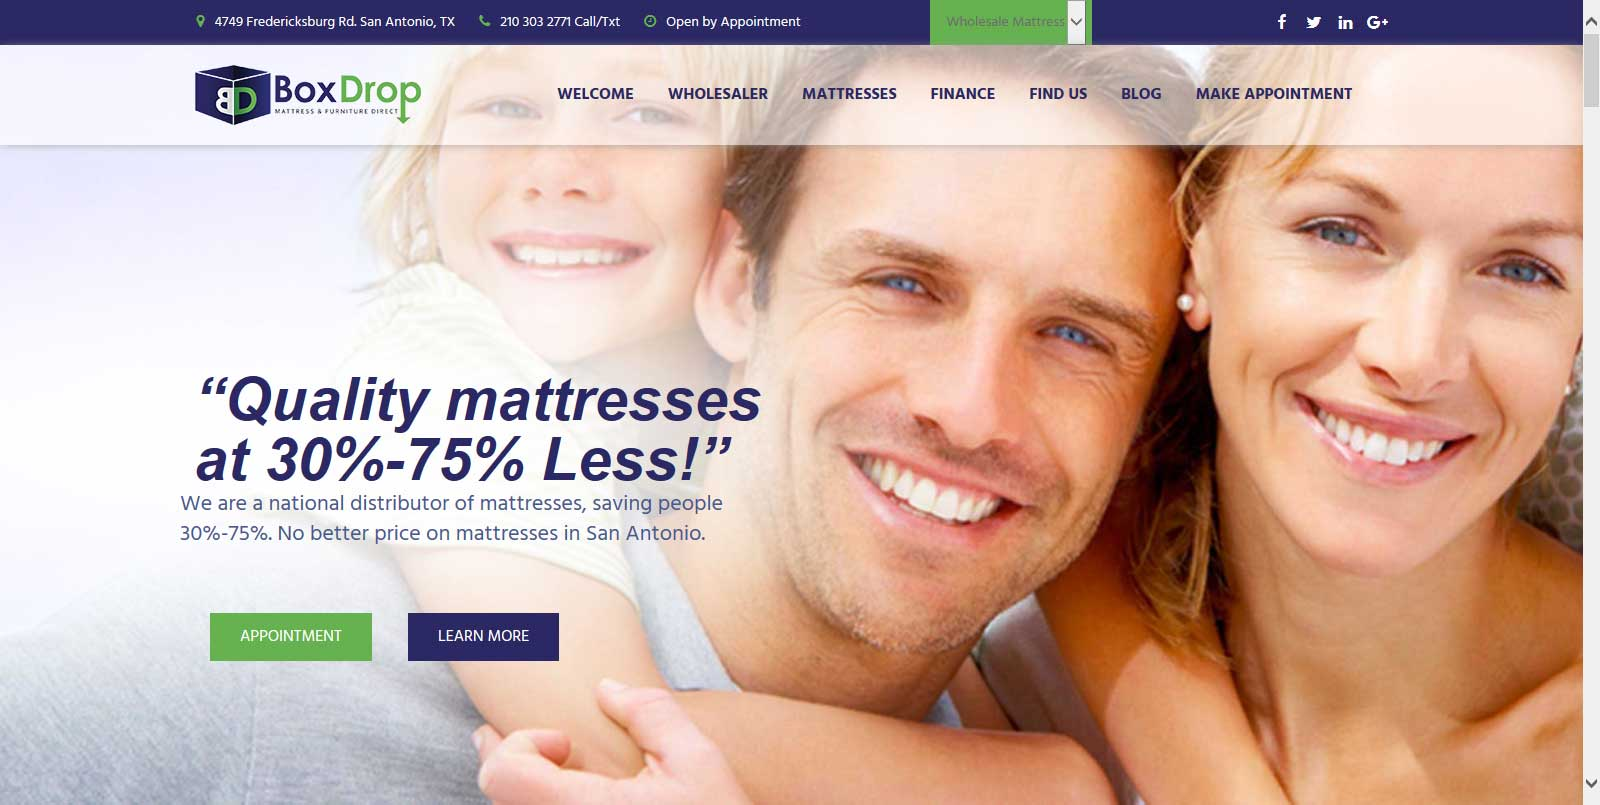 website-design-services-oc.jpg